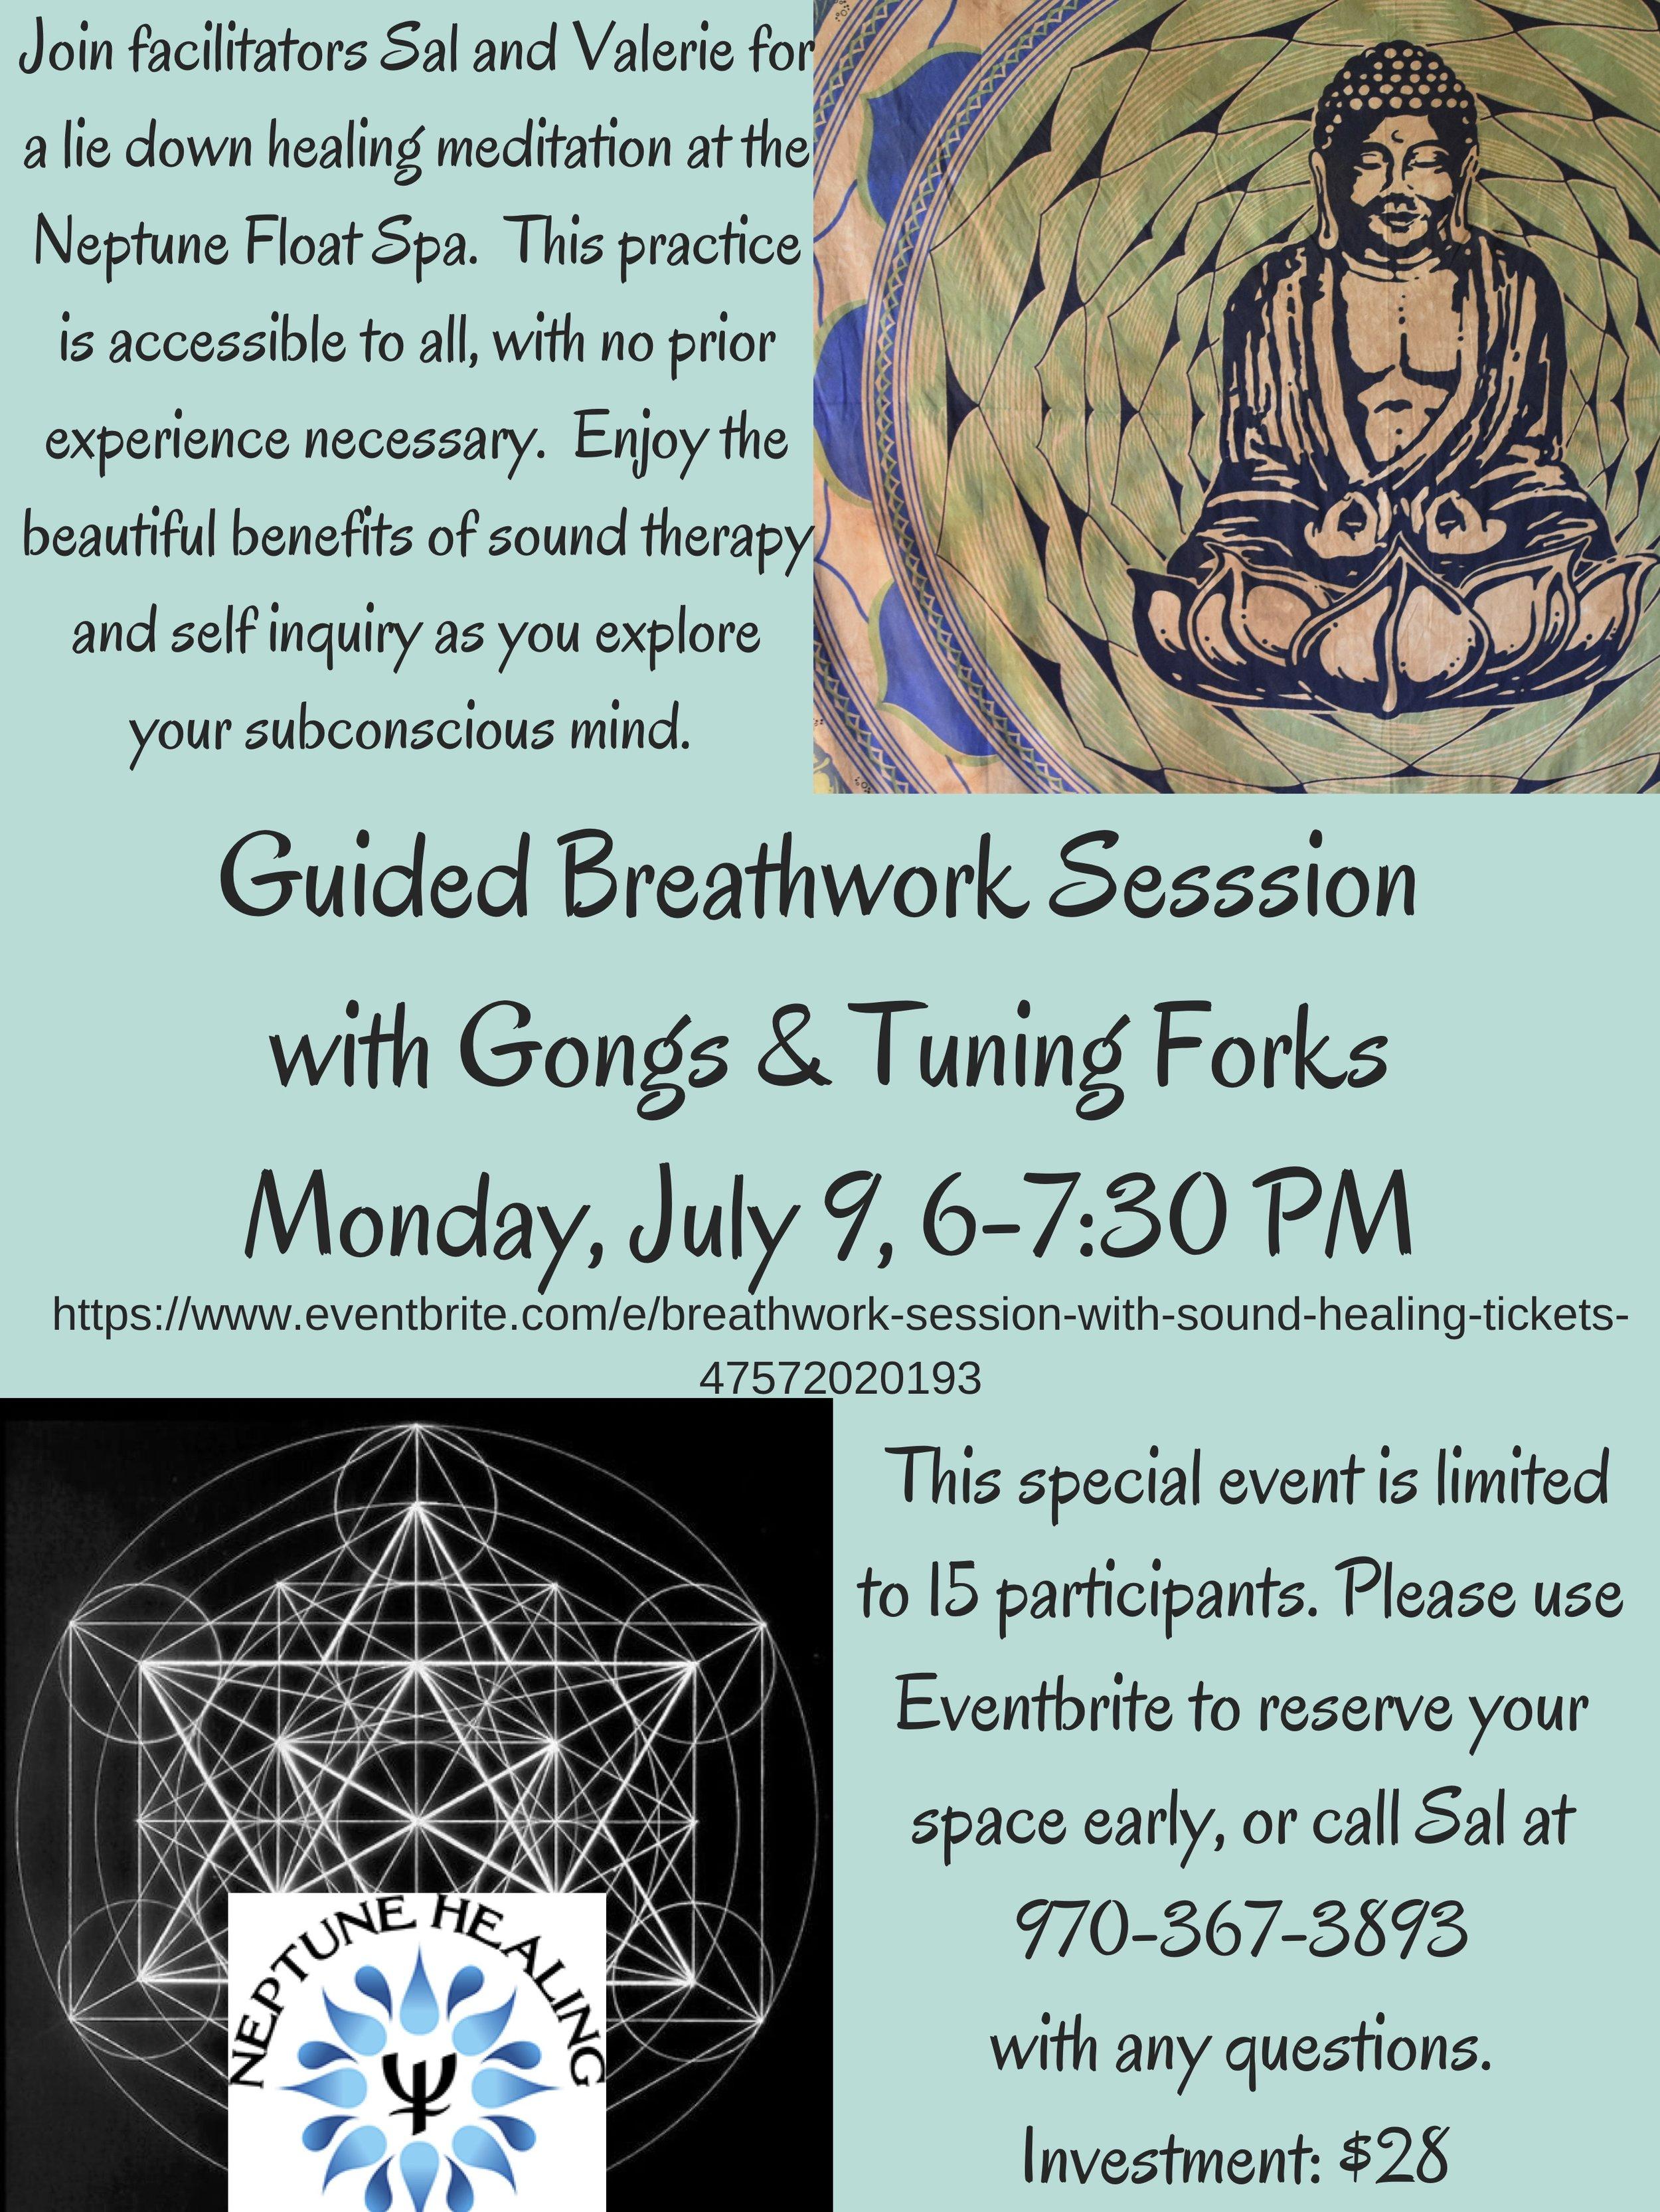 Breathwork conscious circular breathing meditation